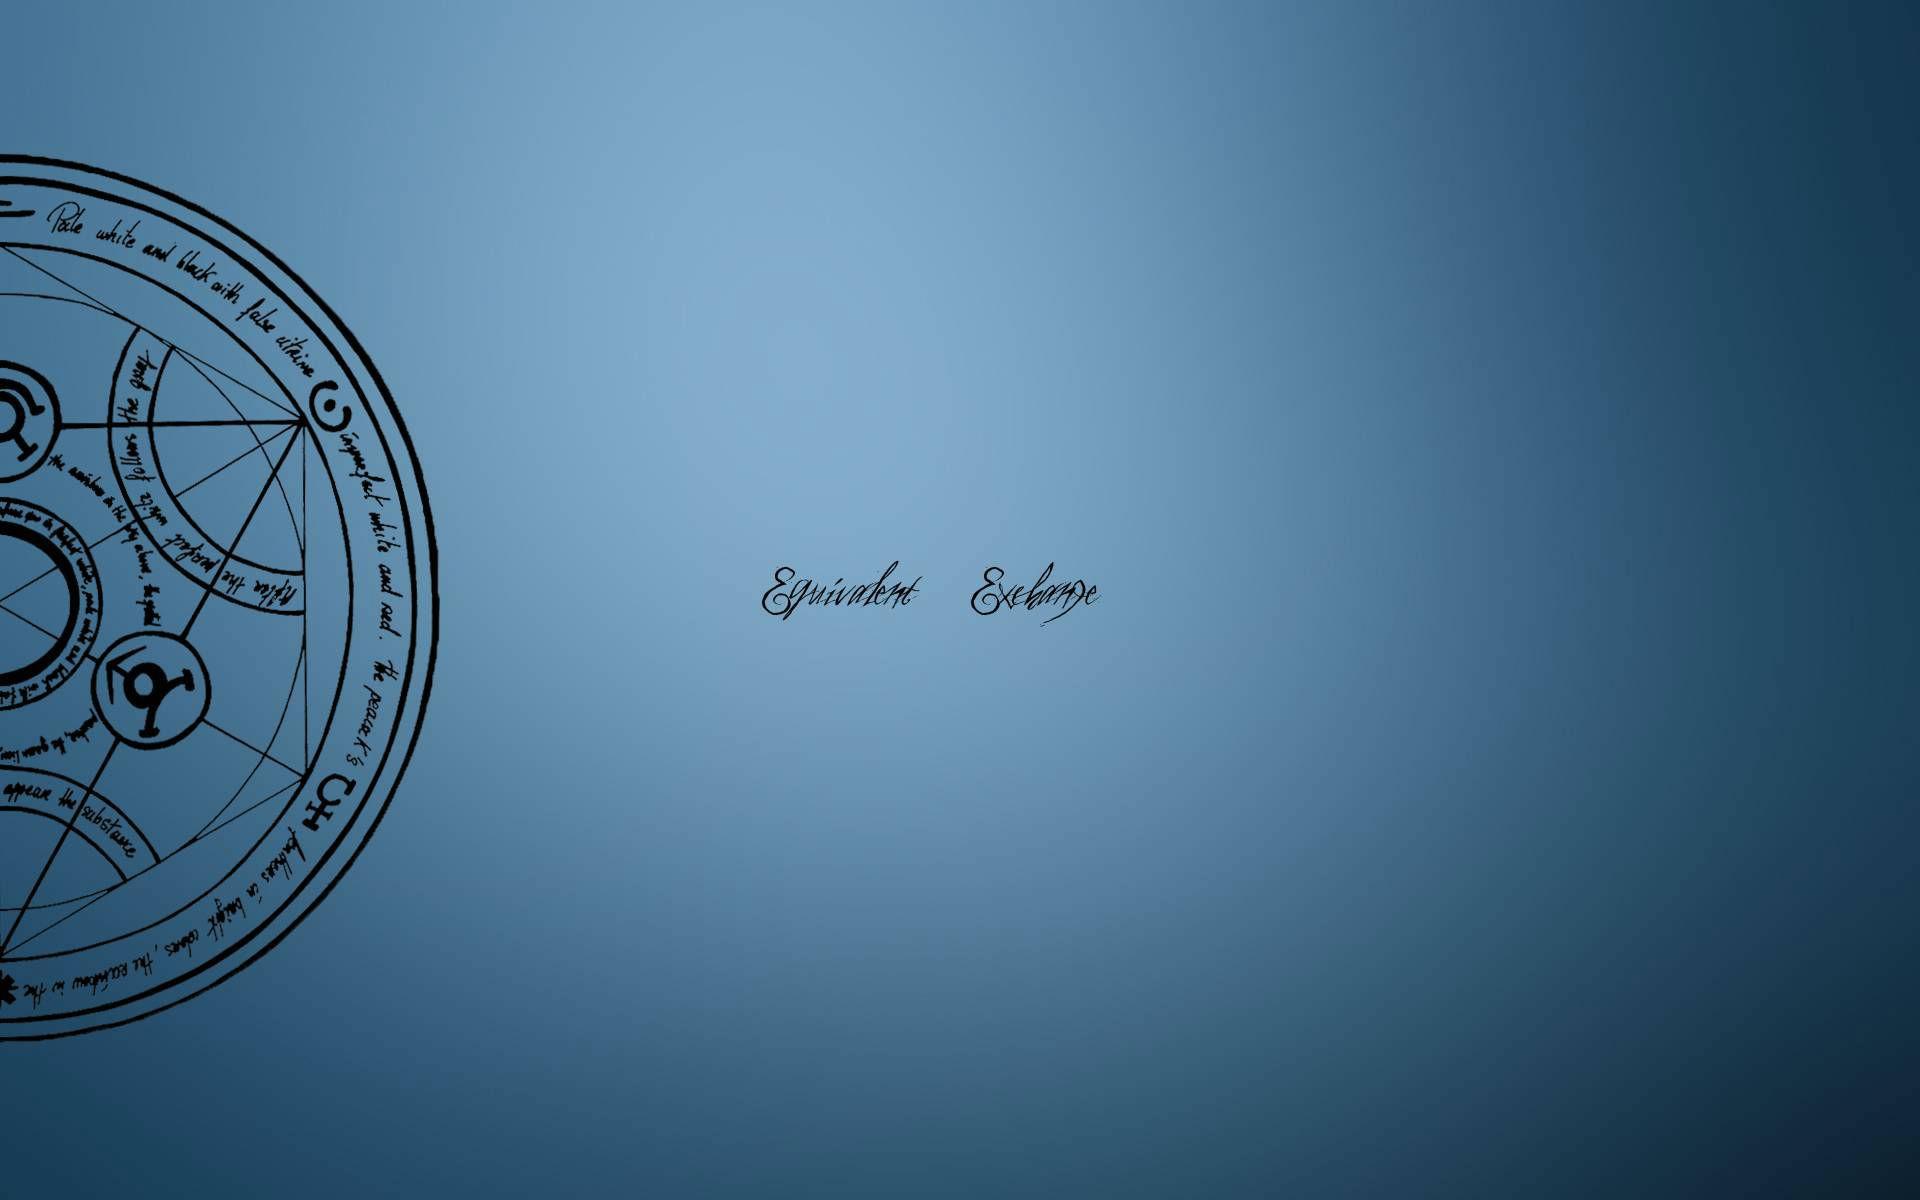 Beautiful Wallpaper Logo Fullmetal Alchemist - illustration-anime-logo-blue-circle-Full-Metal-Alchemist-brand-Fullmetal-Alchemist-Brotherhood-alchemy-shape-line-screenshot-computer-wallpaper-atmosphere-of-earth-font-134126  Collection_193264.jpg